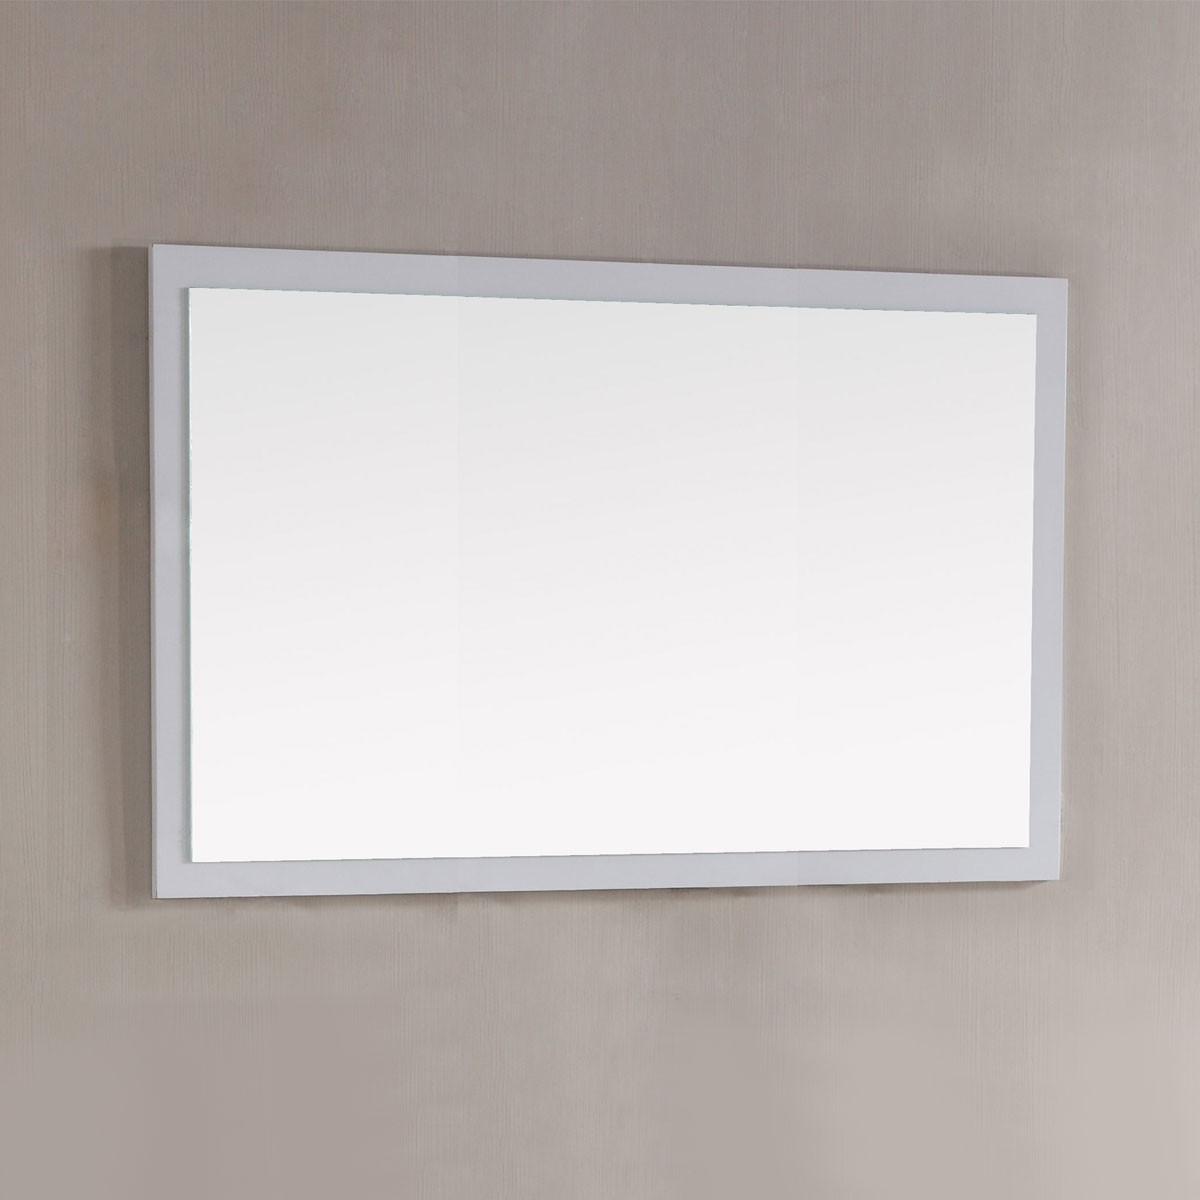 48 x 31 po Miroir avec cadre blanc (DK-T9312-48WM)